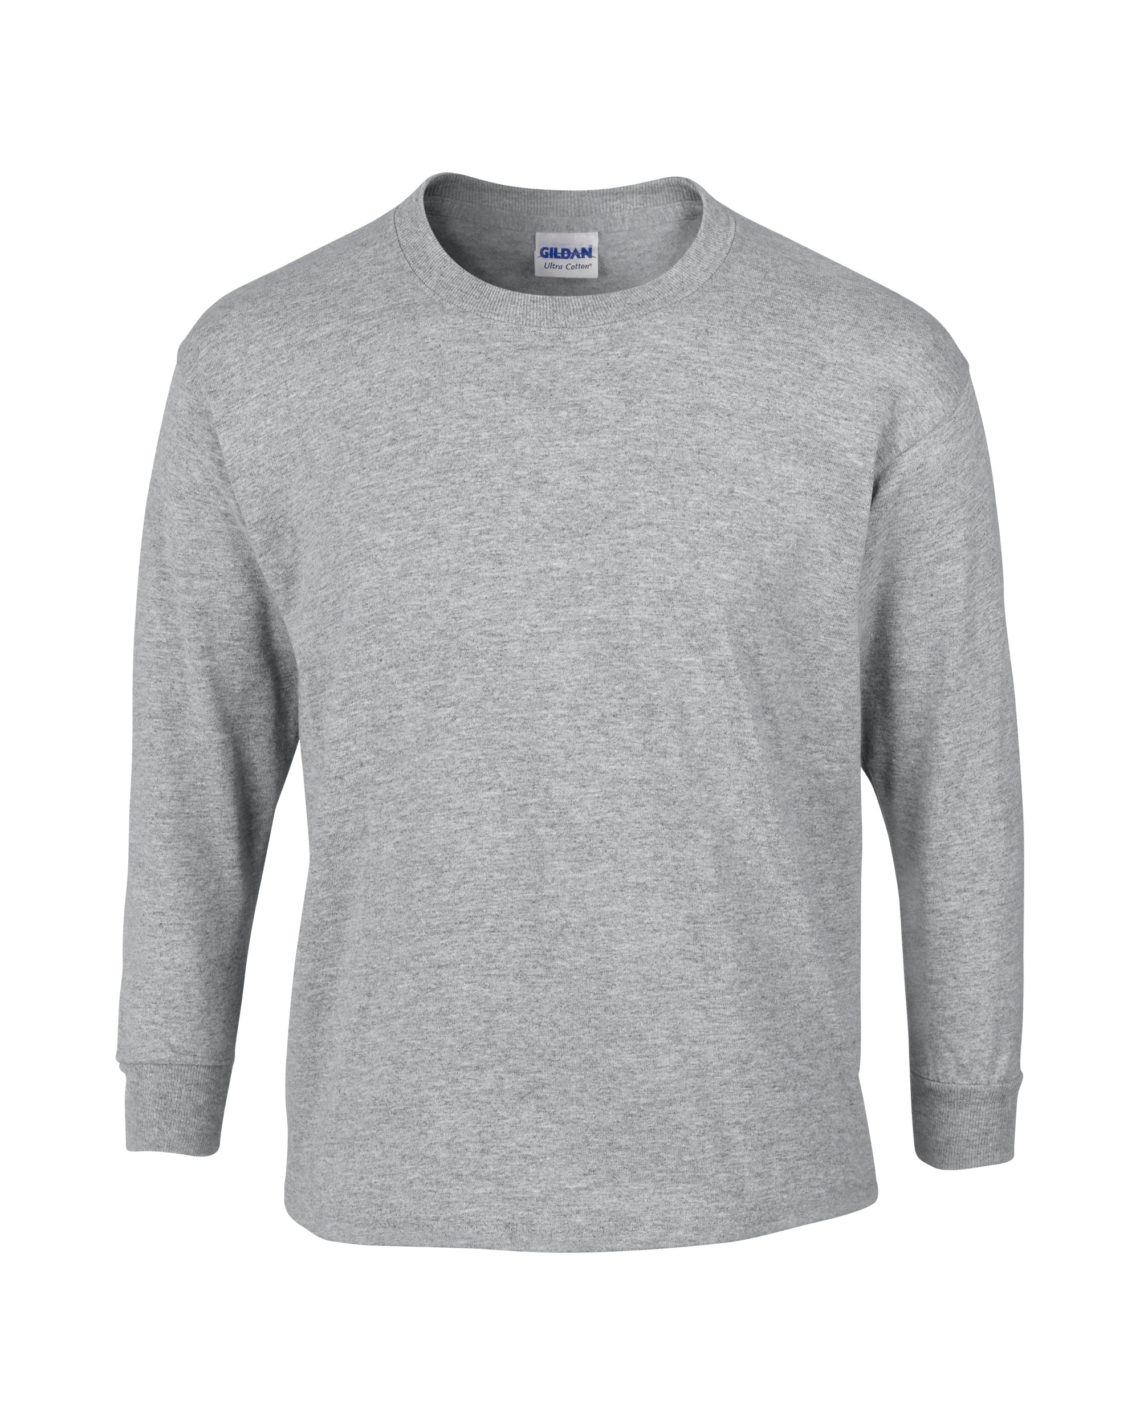 Gildan Youth Long Sleeve Cotton T Shirt G2400b Innovation By Design